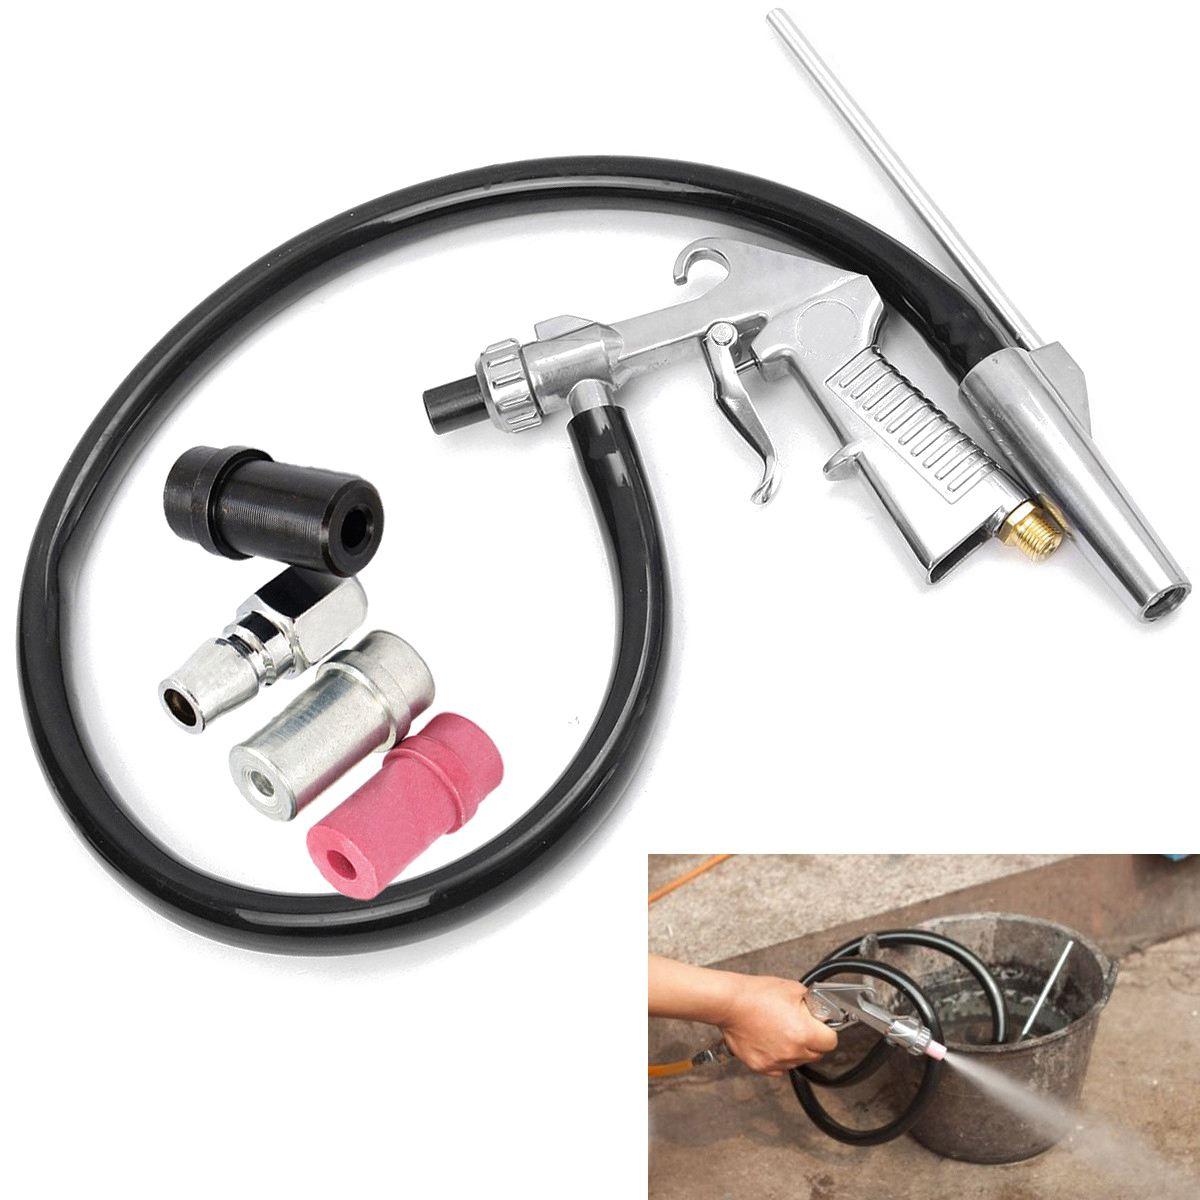 Vendita calda Aria Sabbiatrice Sabbiatura Pistola A Getto + Ugelli + Connettore + Tubo Ruggine Tool Kit